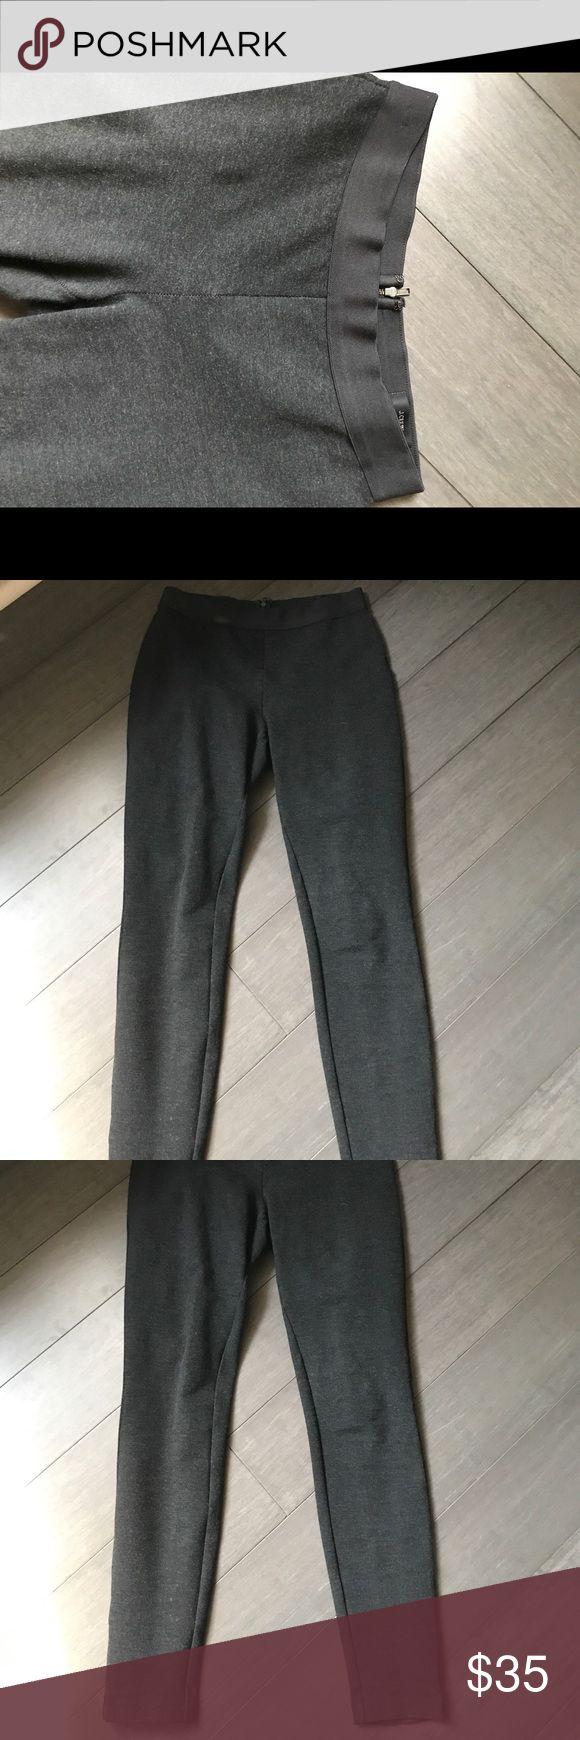 J Crew Pixie Pant EUC-Gray 2R Great condition! J. Crew Pants Leggings